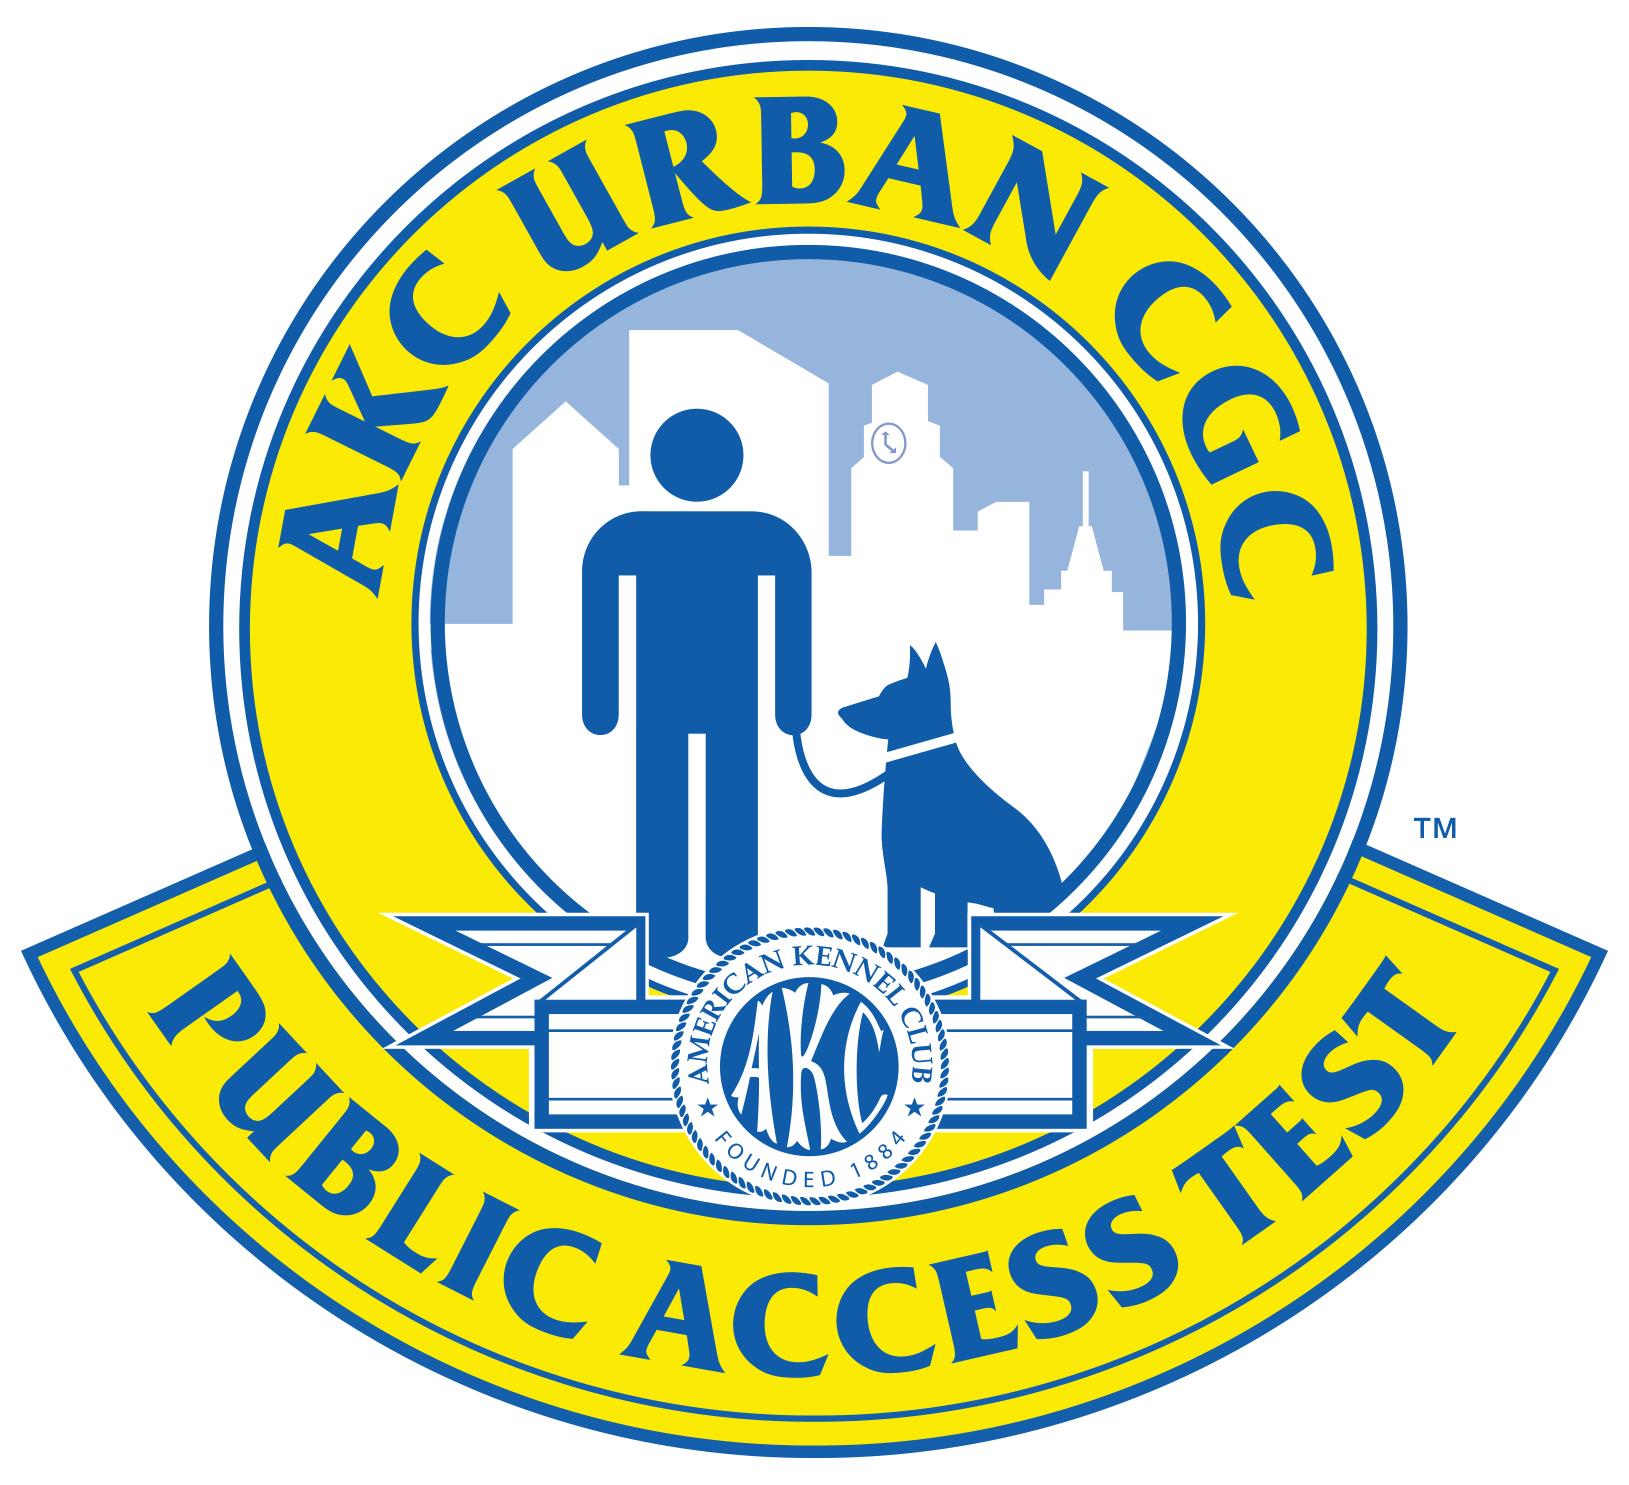 AKC-Urban-CGC-Public-Access-Test-Logo_.jpg